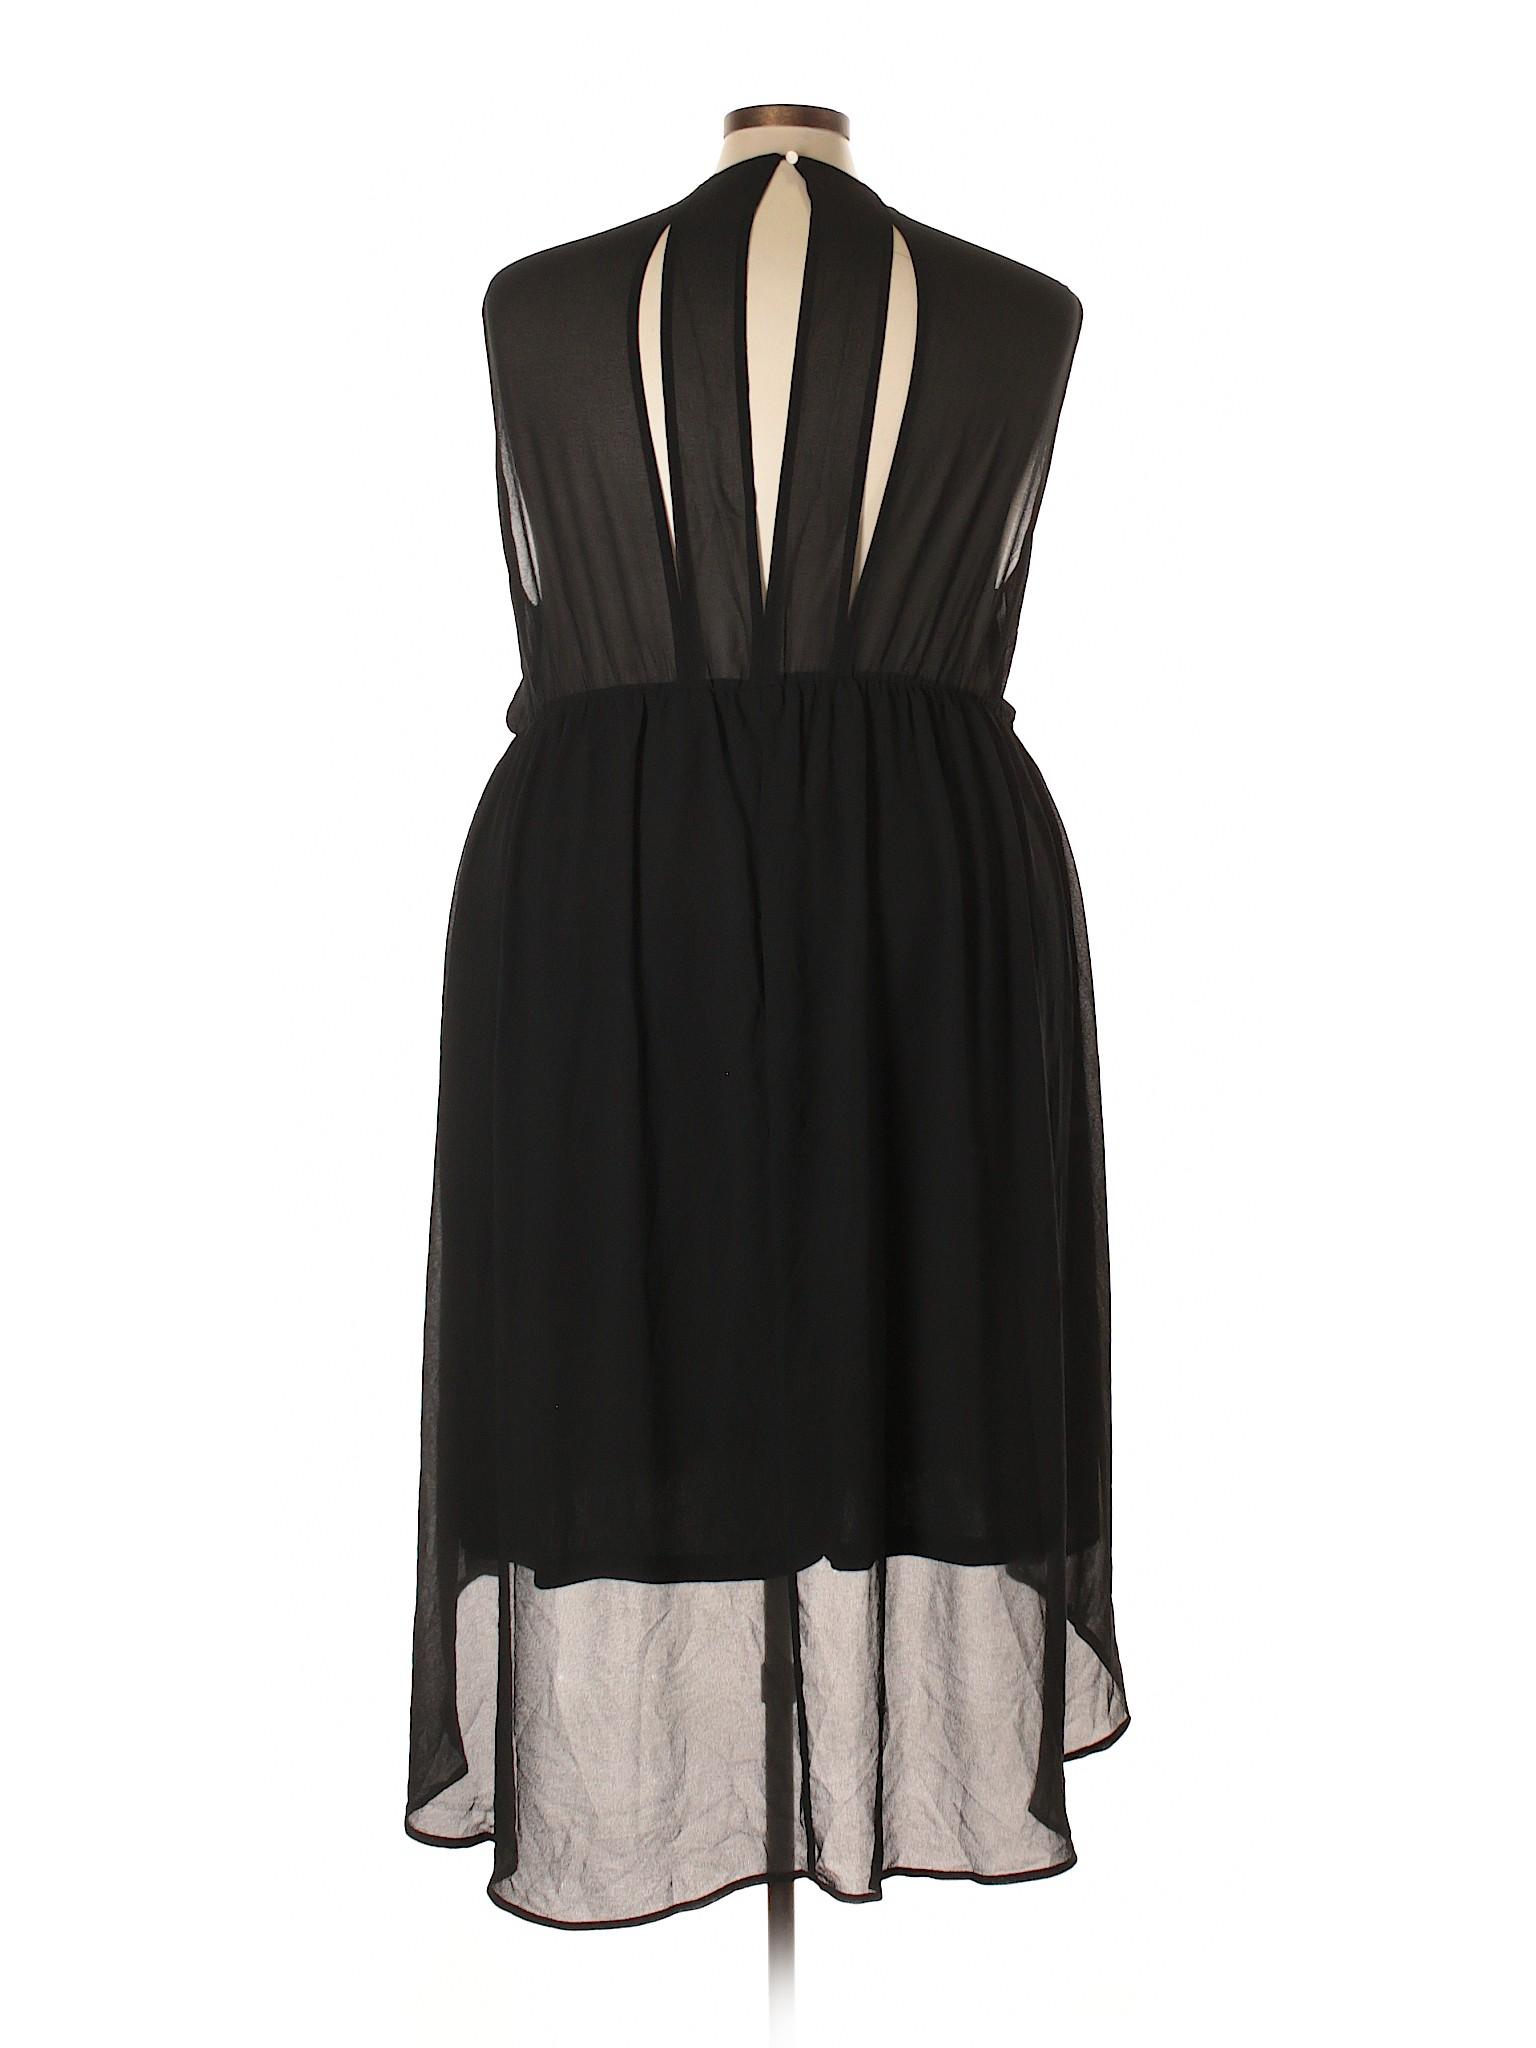 Torrid Casual Boutique Dress winter winter Boutique 71ctHFZFq